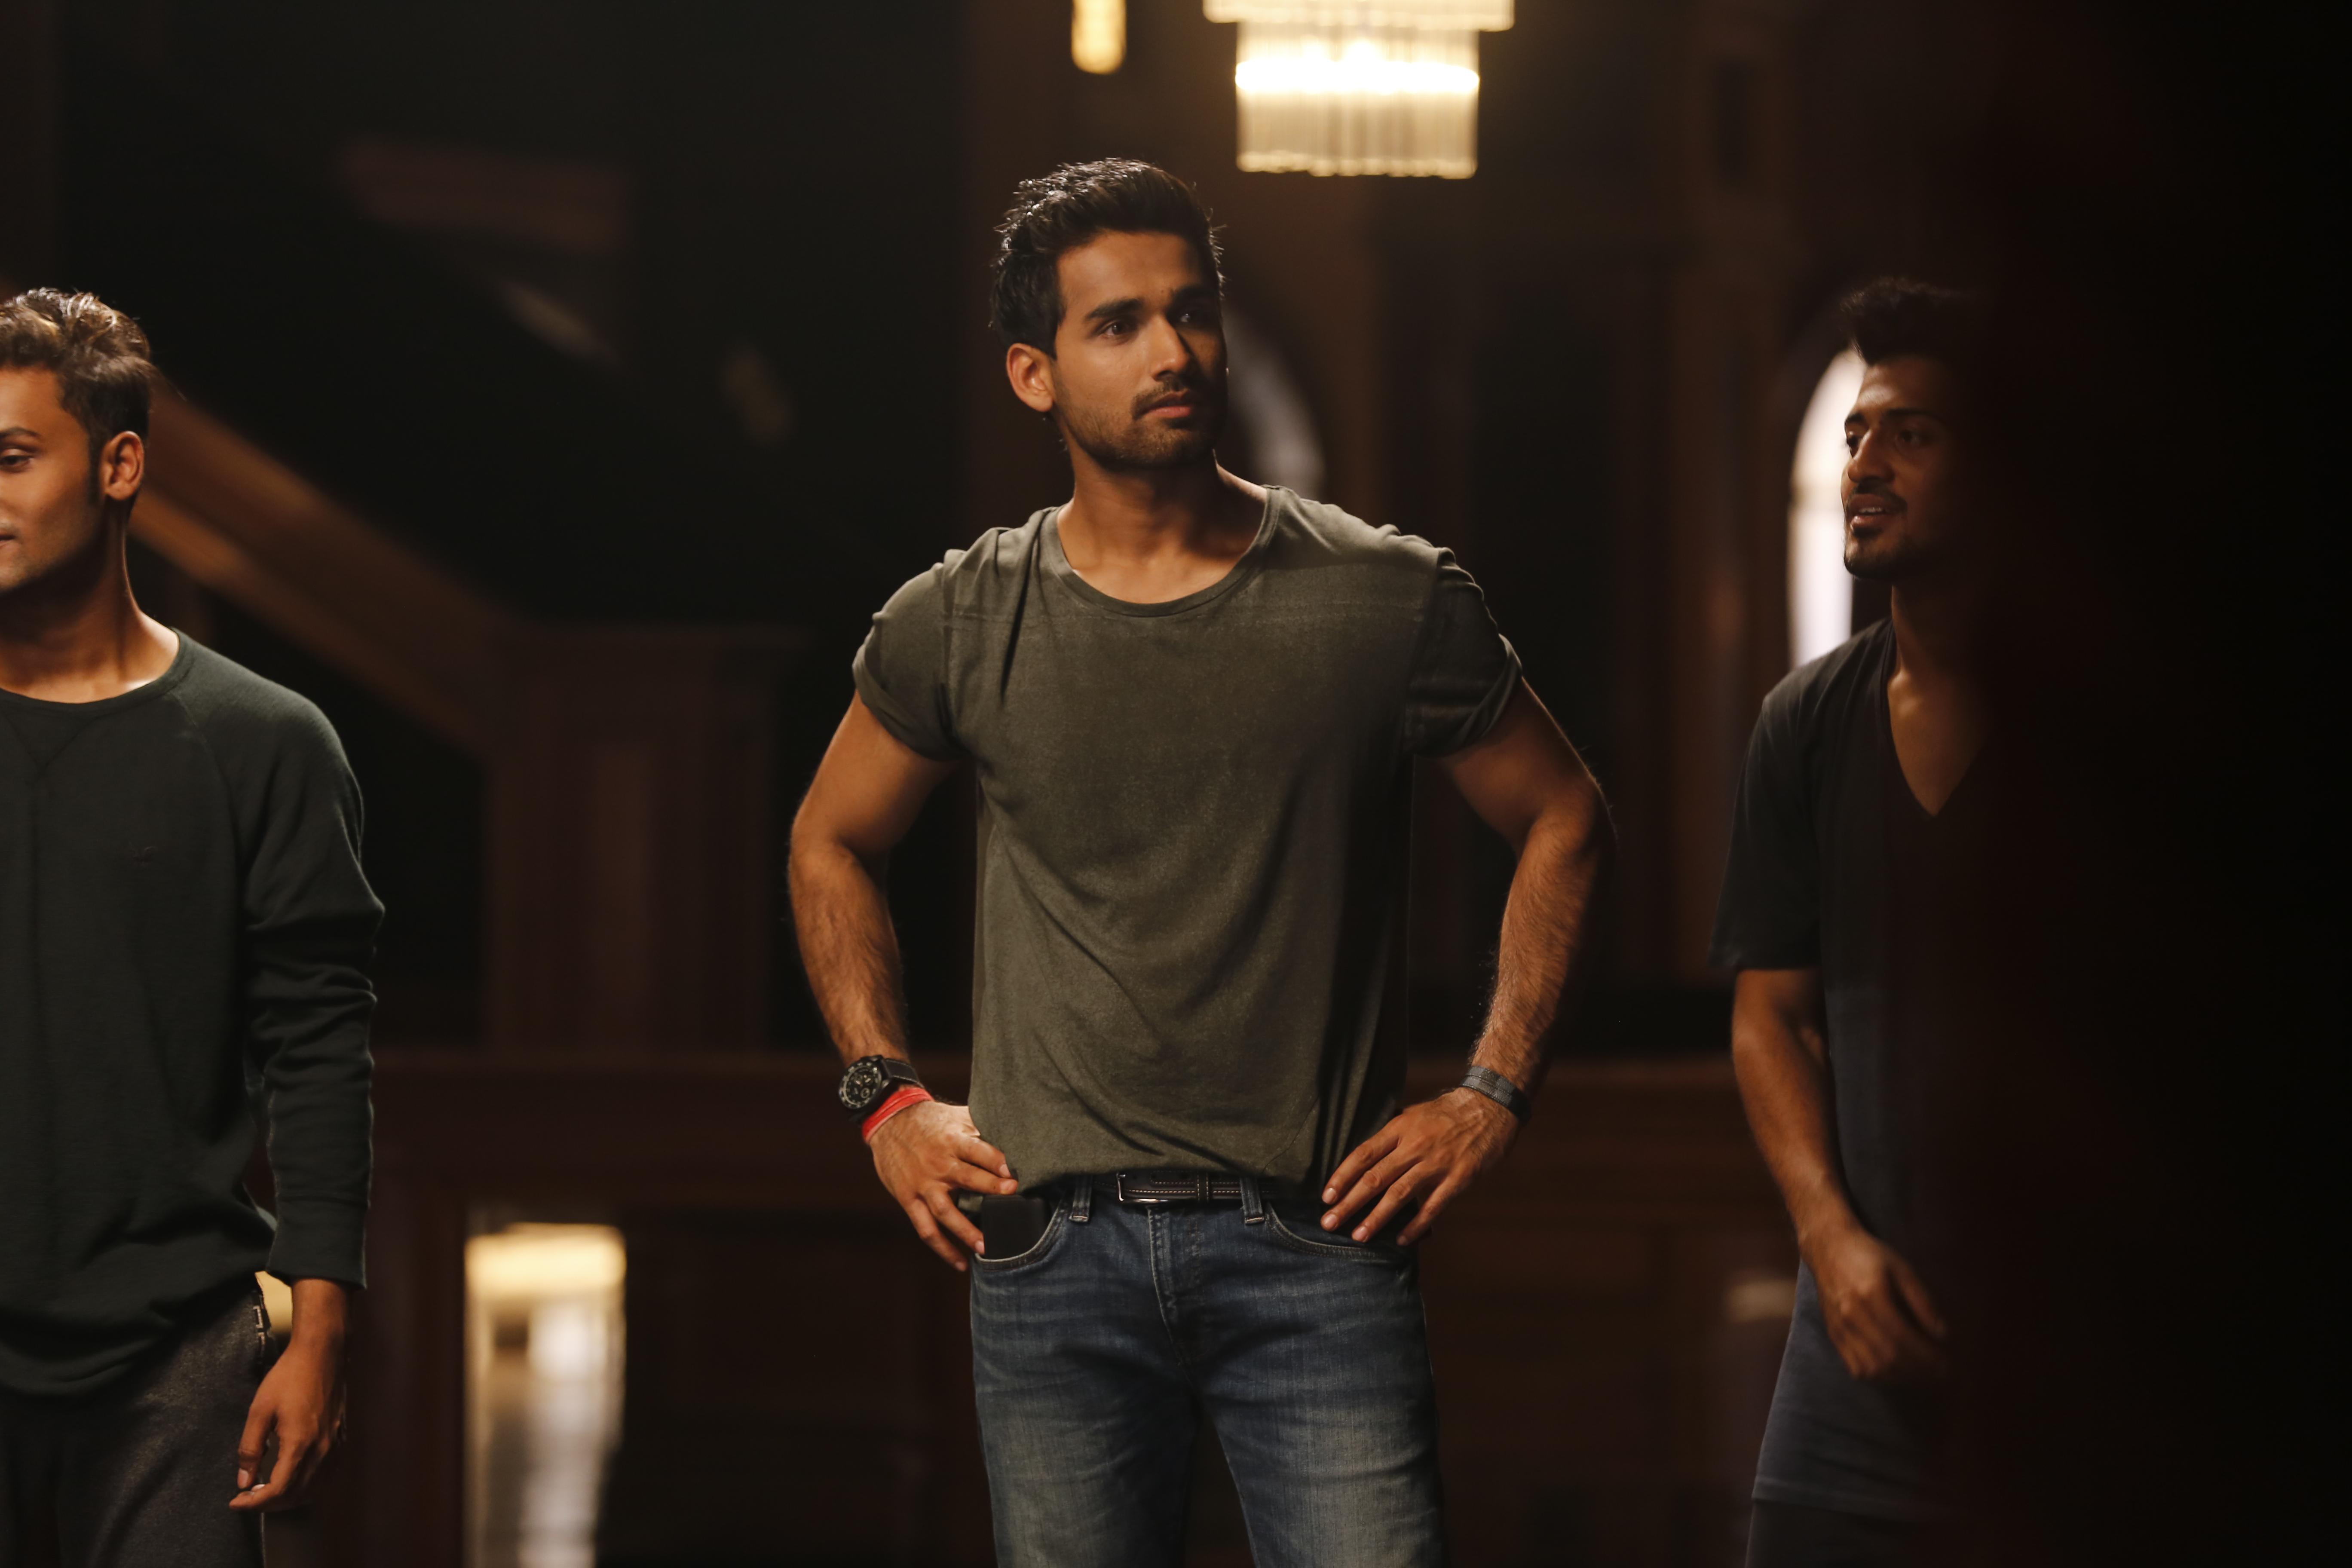 Amitash Pradhan in Heartbeats (2017)